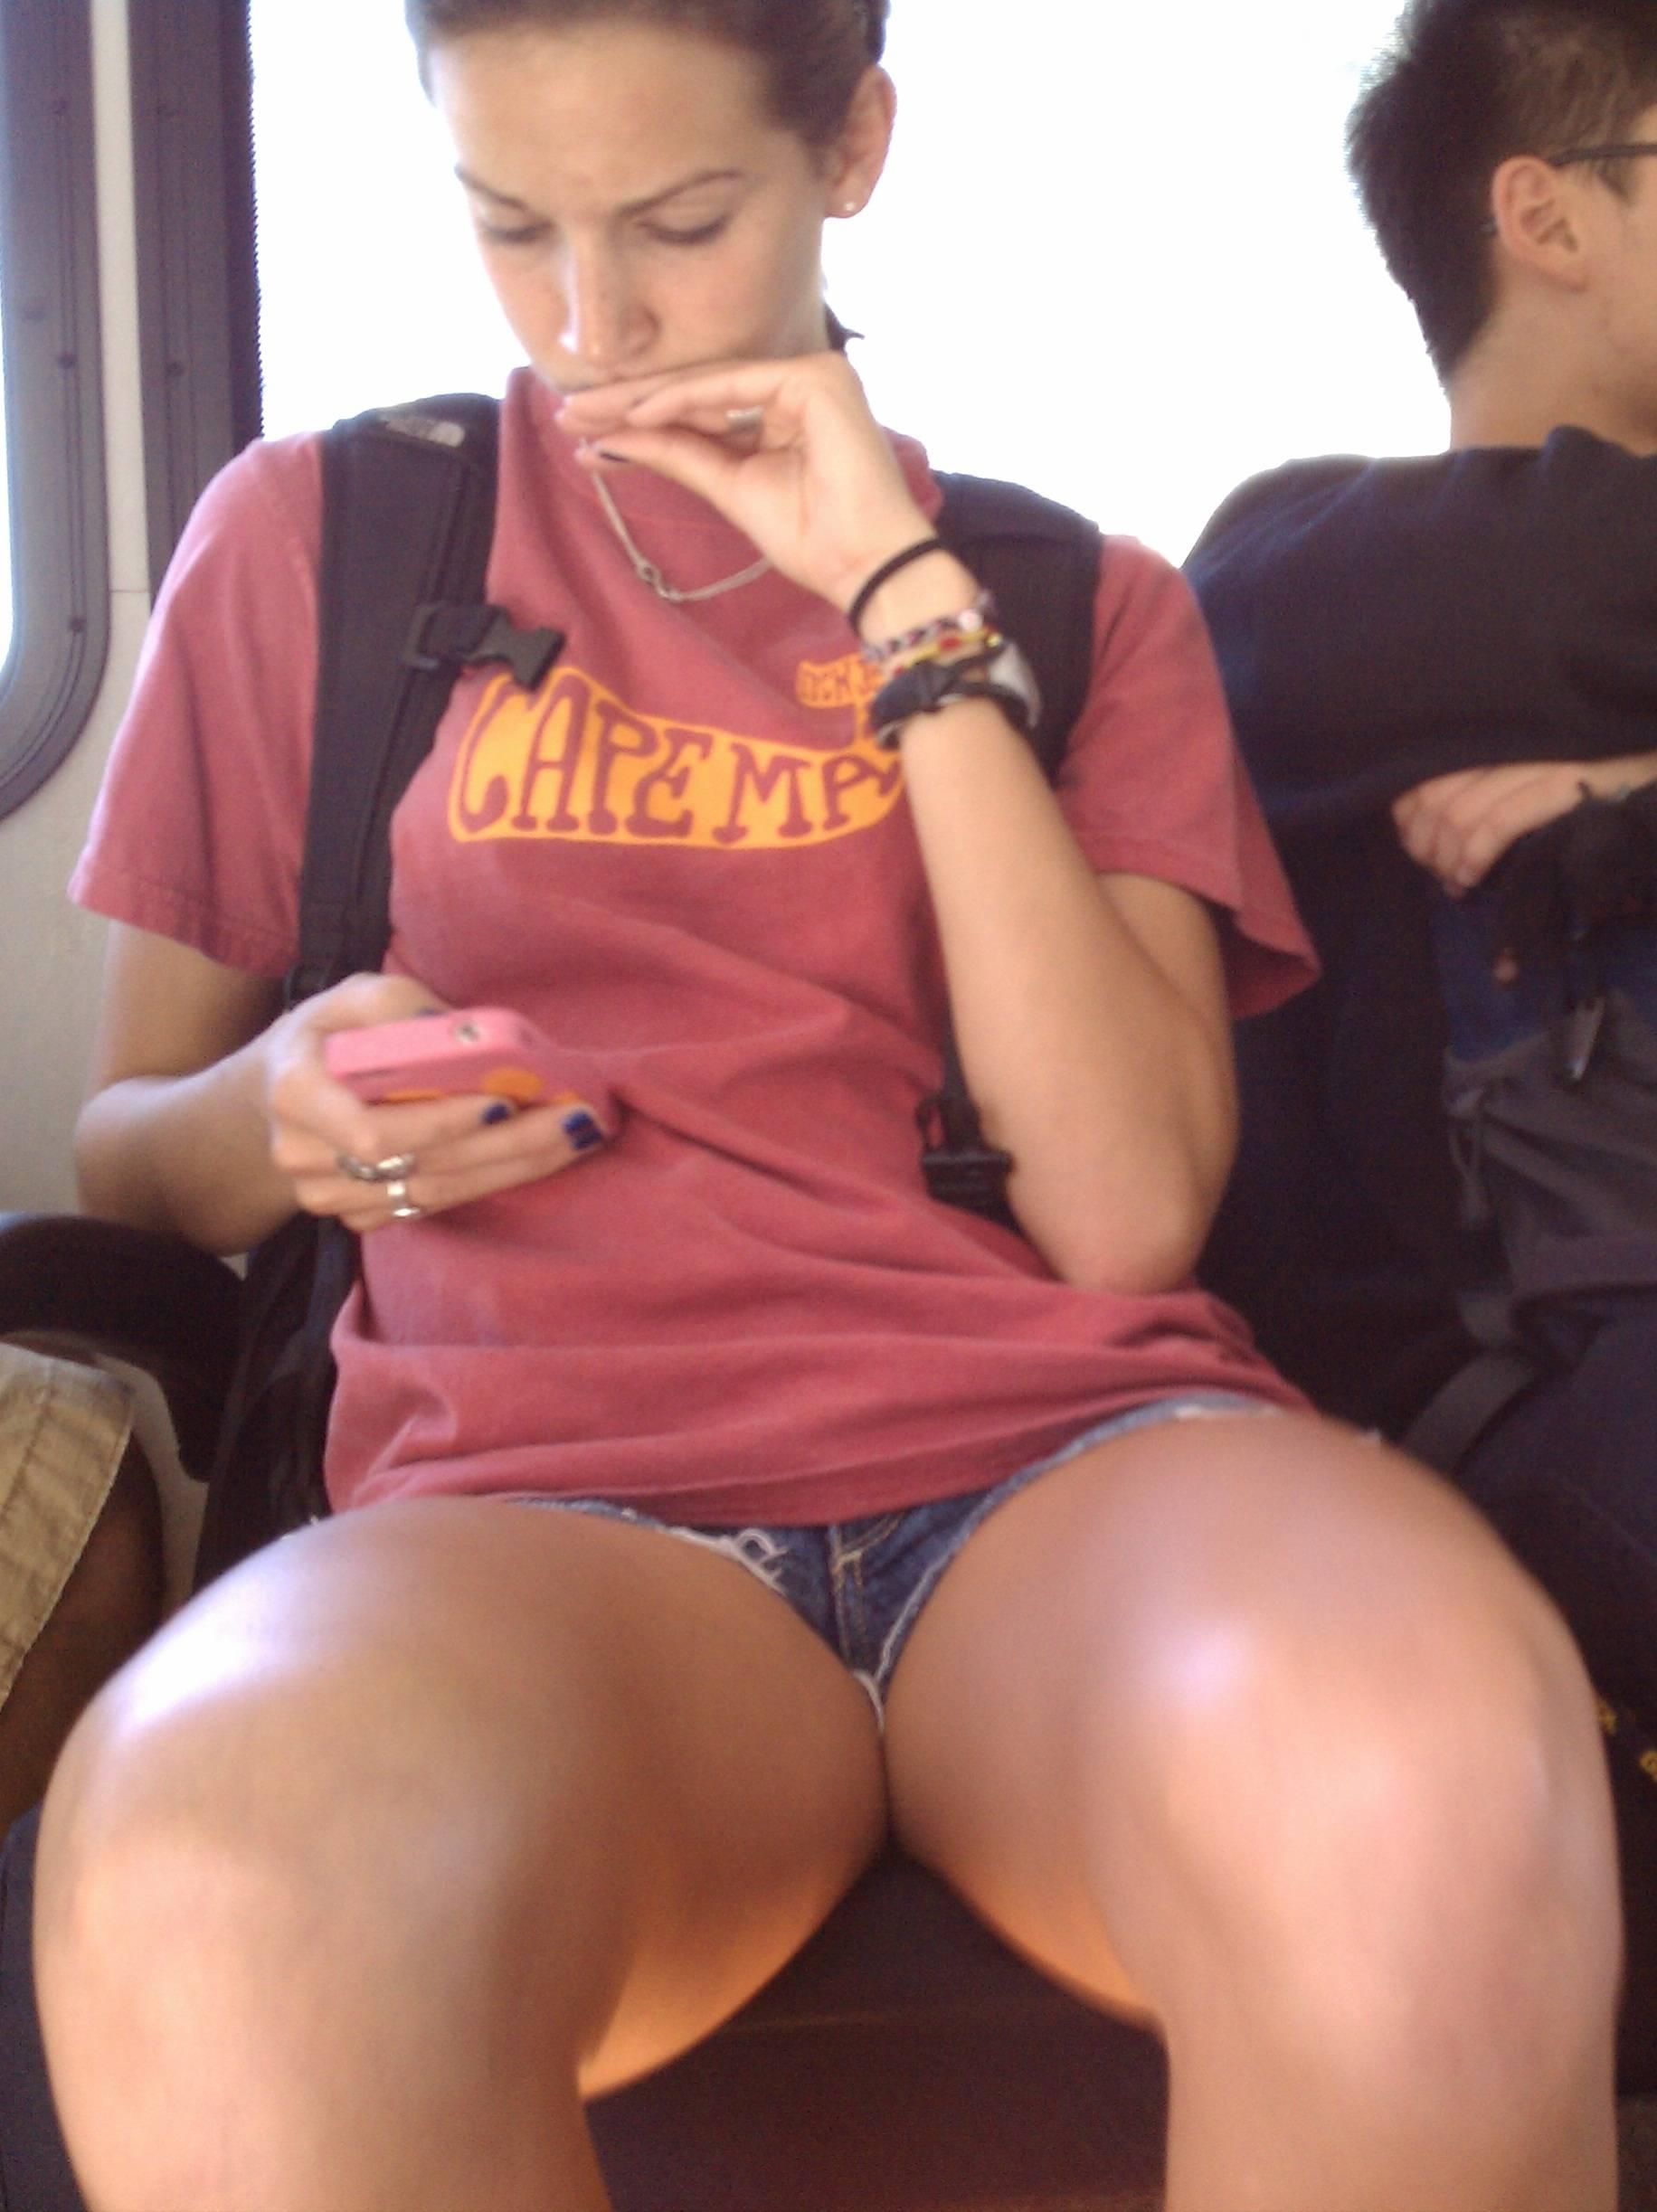 19 yo college girl i met on dating site 6